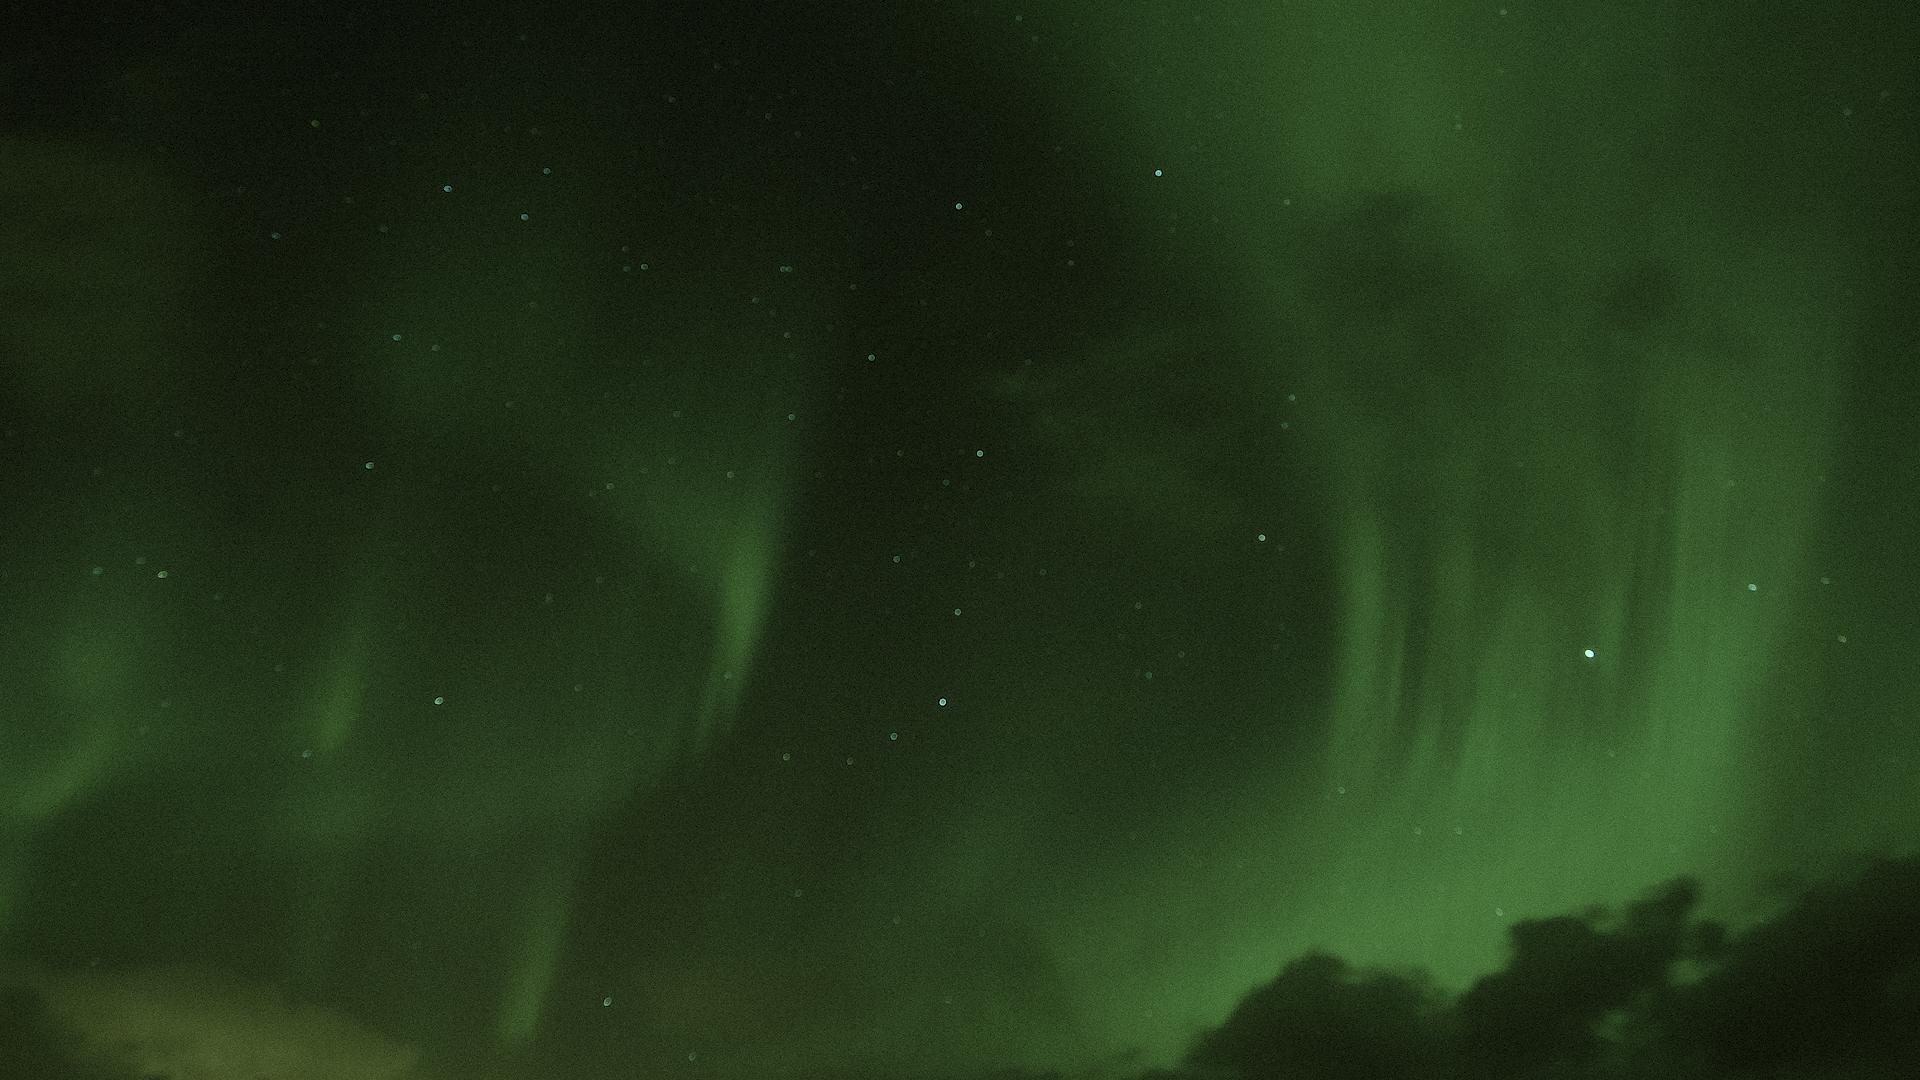 Aurora Borealis photography 360 iralta vr